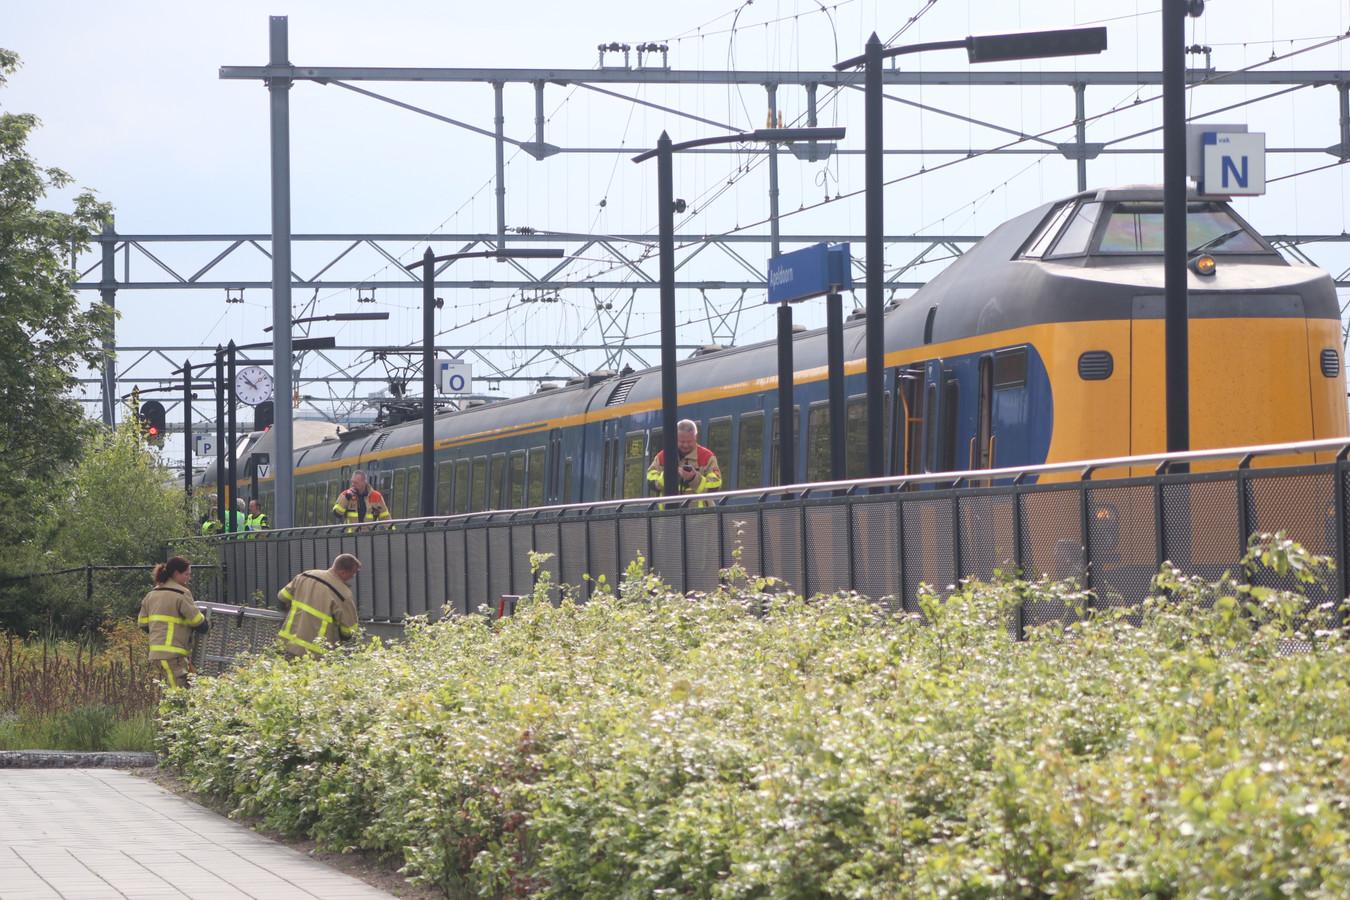 De trein reed net station Apeldoorn binnen.